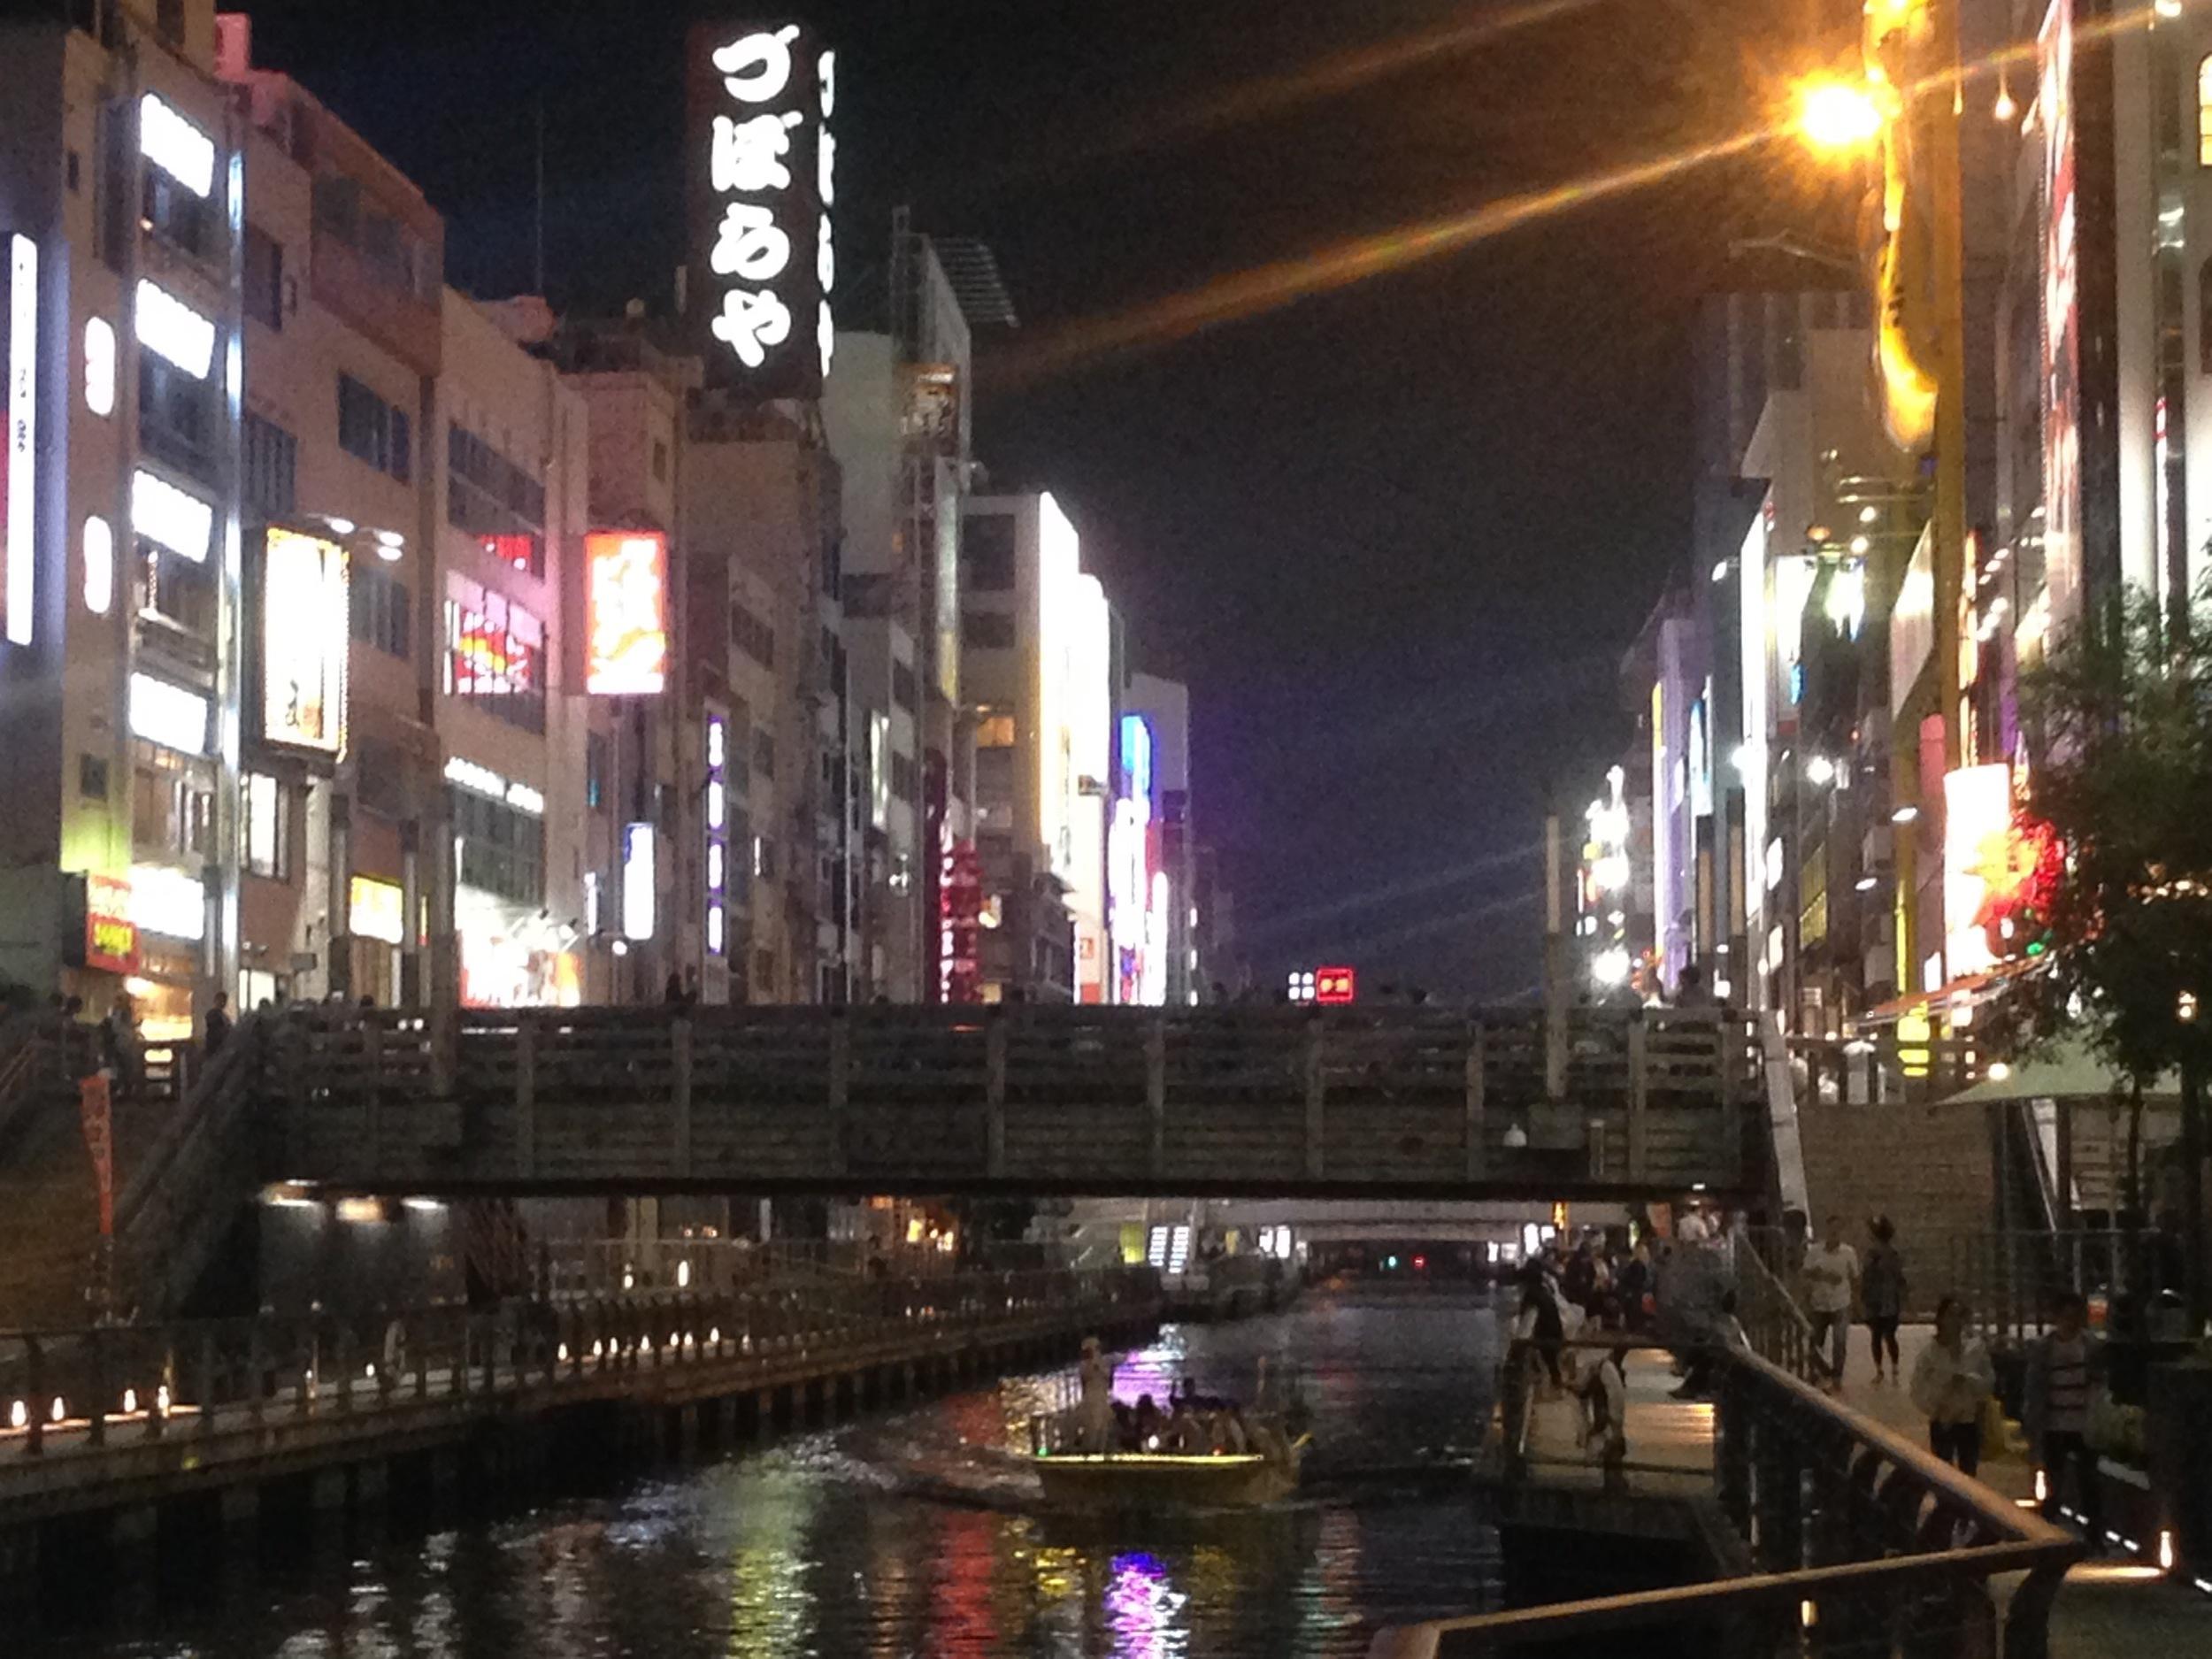 Dotonbori Canal at night and the Dōtonboribashi Bridge